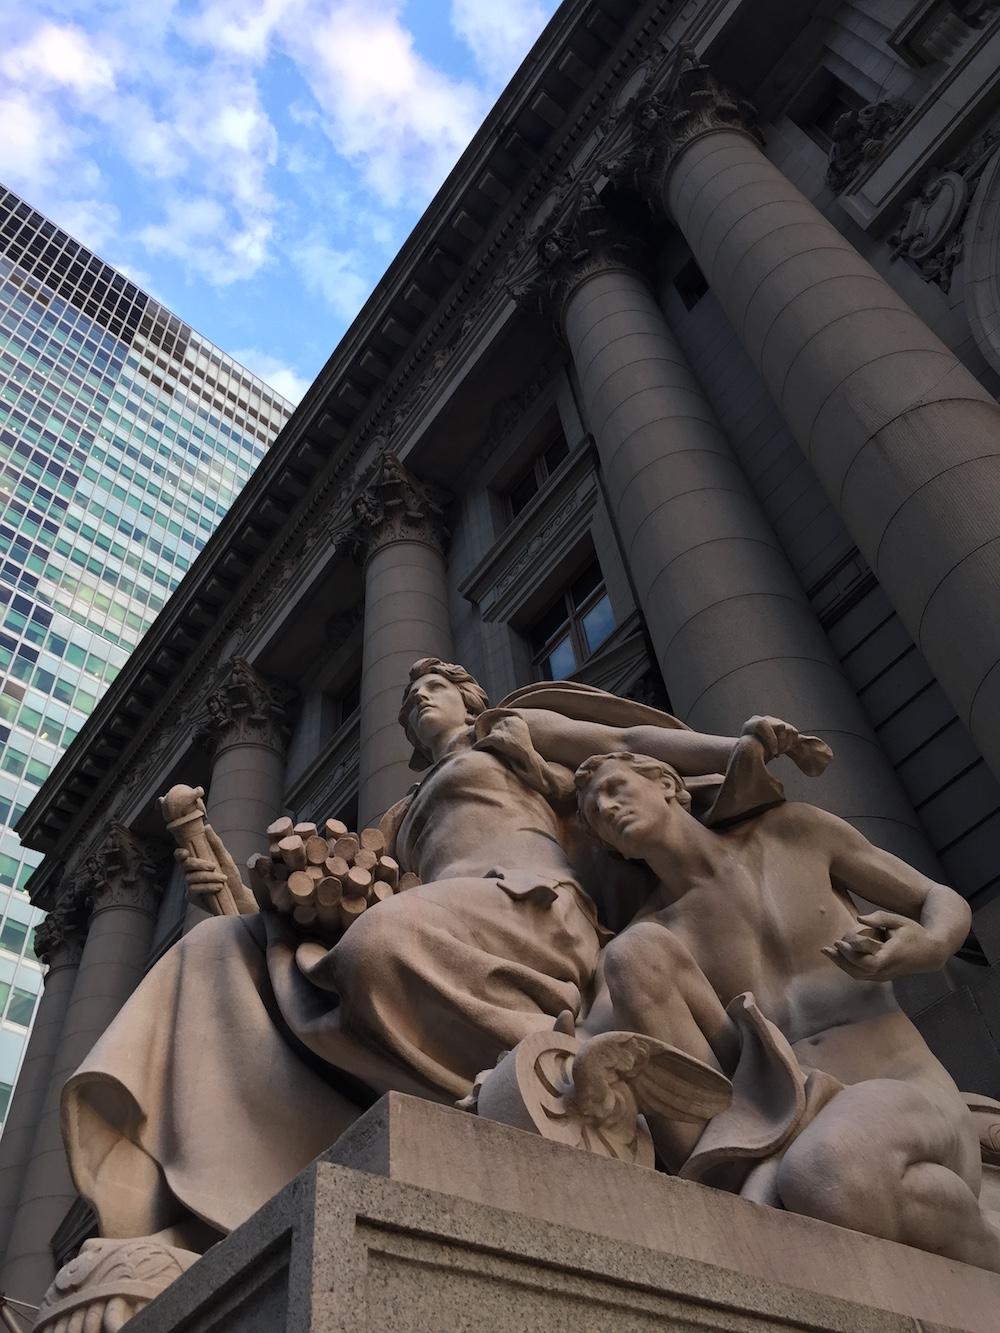 Alexander Hamilton U.S. Custom House in NYC | Photo credit: Rose Spaziani